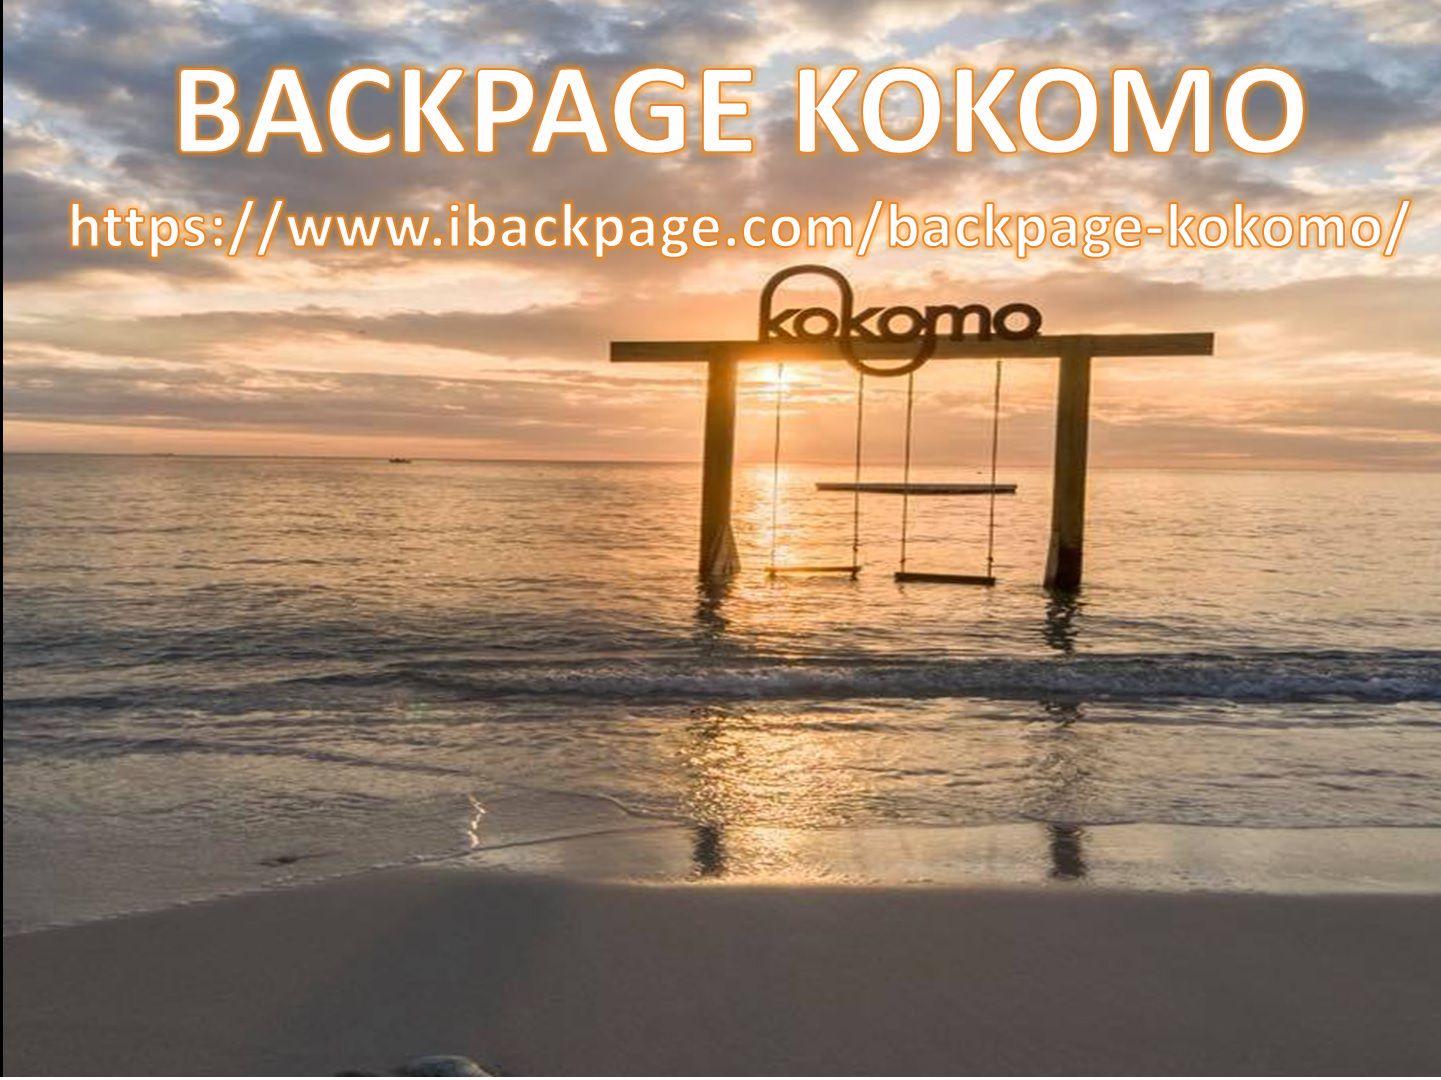 Kokomo backpage